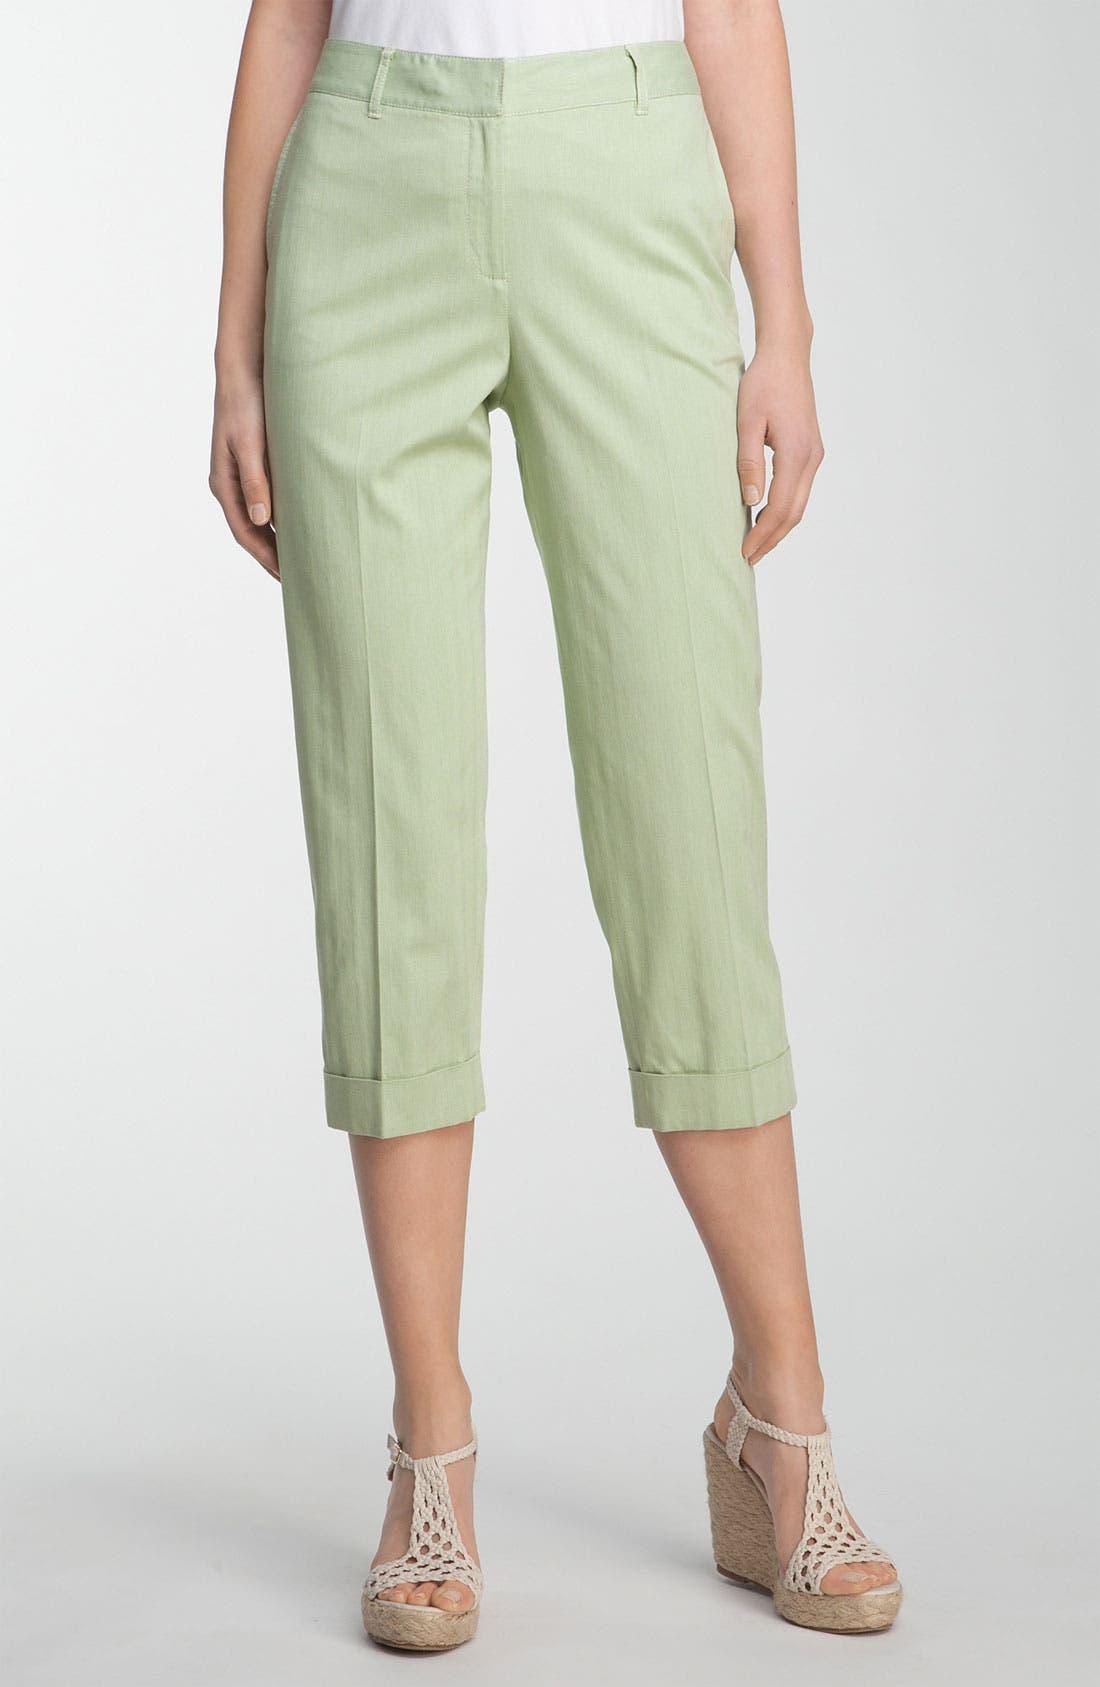 Alternate Image 1 Selected - Lafayette 148 New York 'Static Stripe' Cuffed Crop Pants